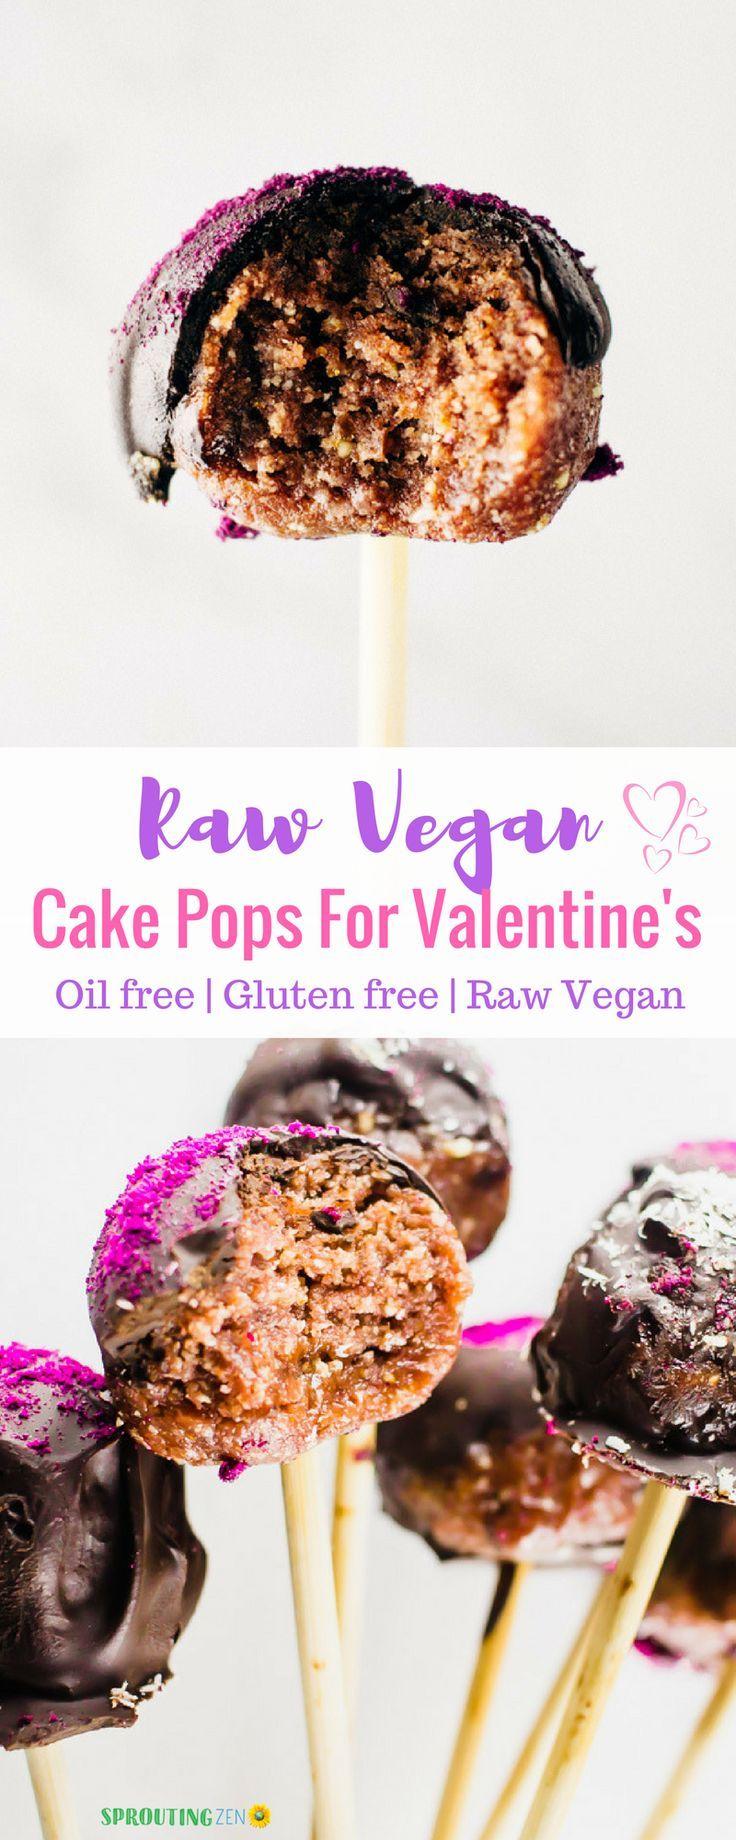 Raw Vegan Cake Pops For Valentine's Day #vegan #plantbased #valentinesdayrecipes  via @sproutingzeneats